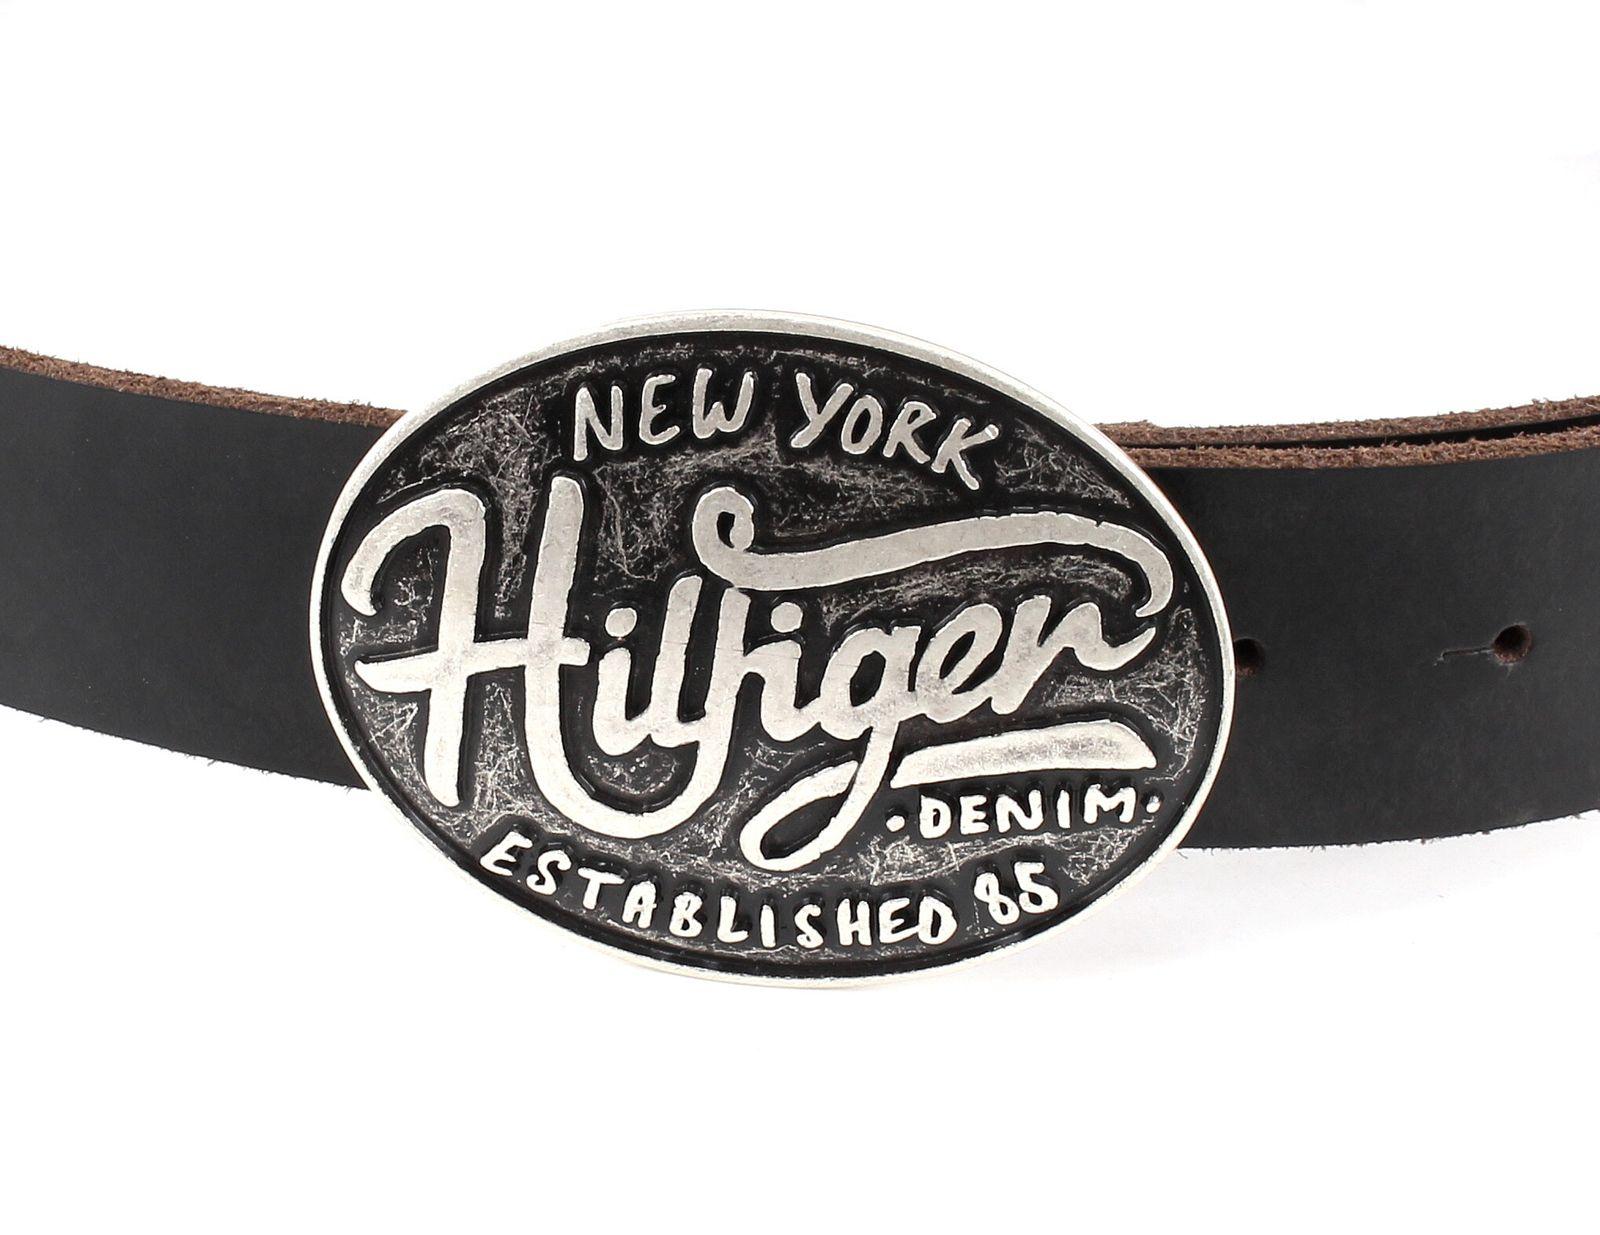 tommy hilfiger denim belt thd buckle 4 0 w80 dark brown. Black Bedroom Furniture Sets. Home Design Ideas